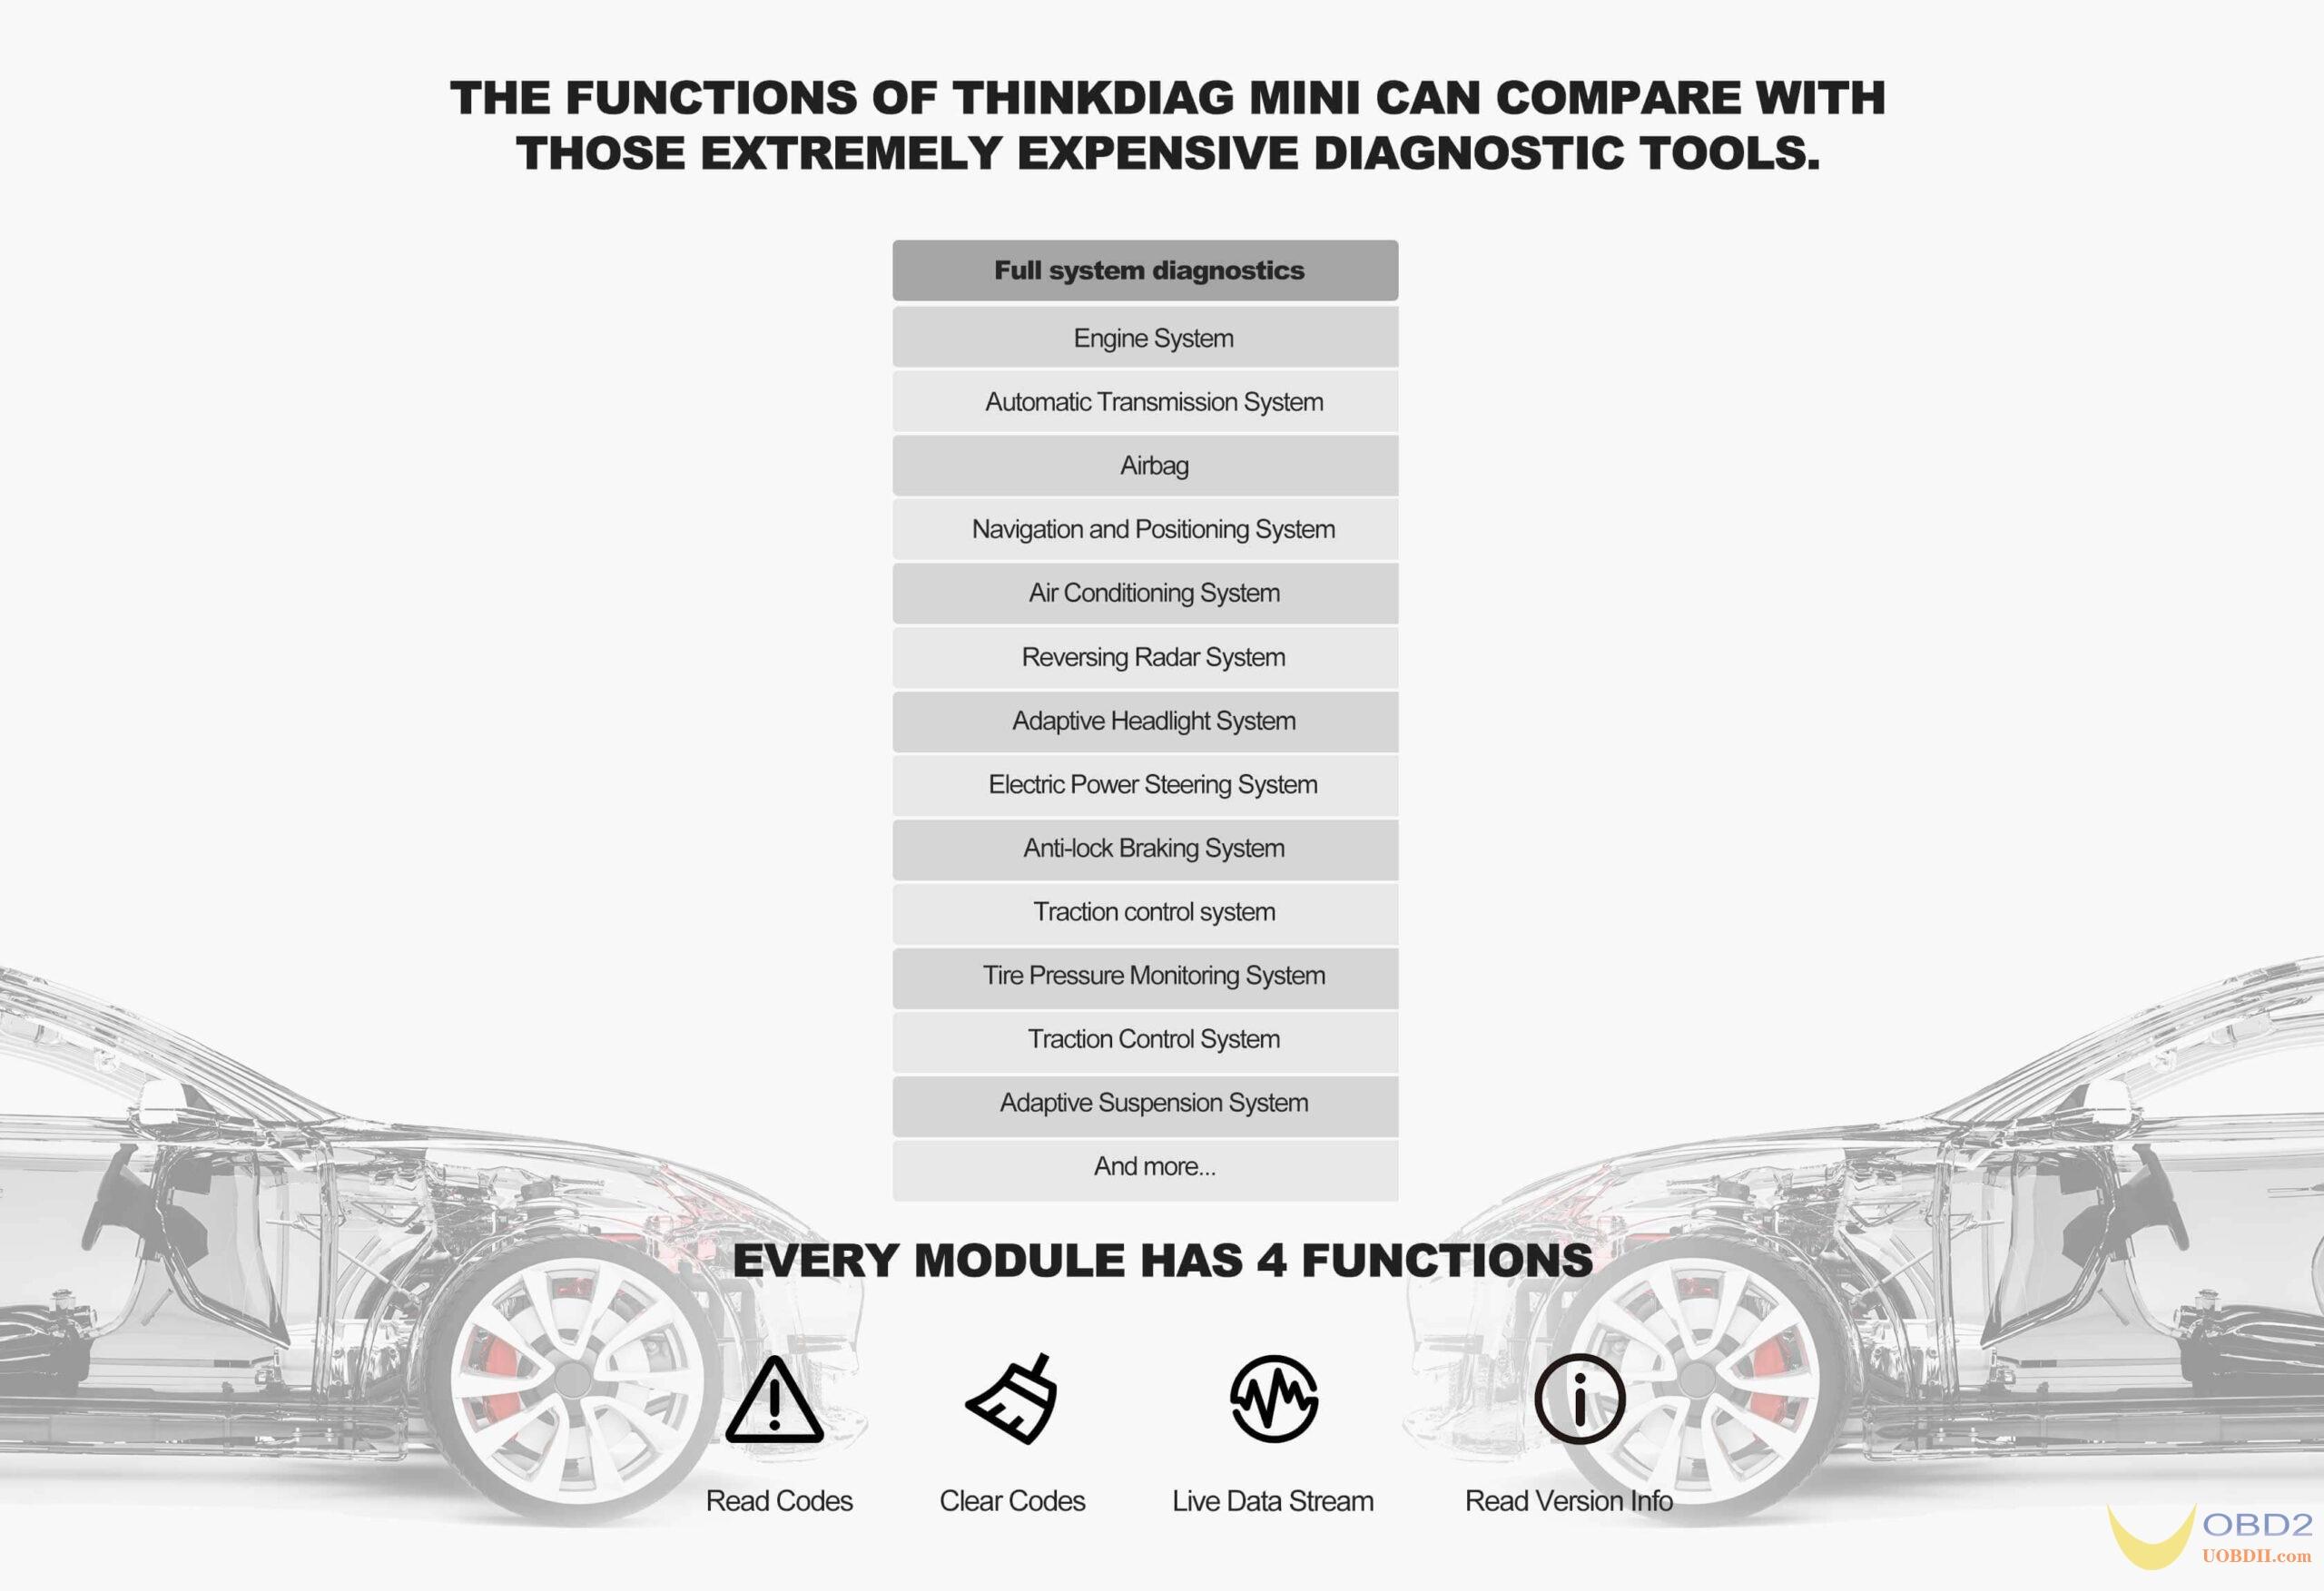 launch-thinkdiag-vs-thinkcar-pro-vs-thinkcar-02